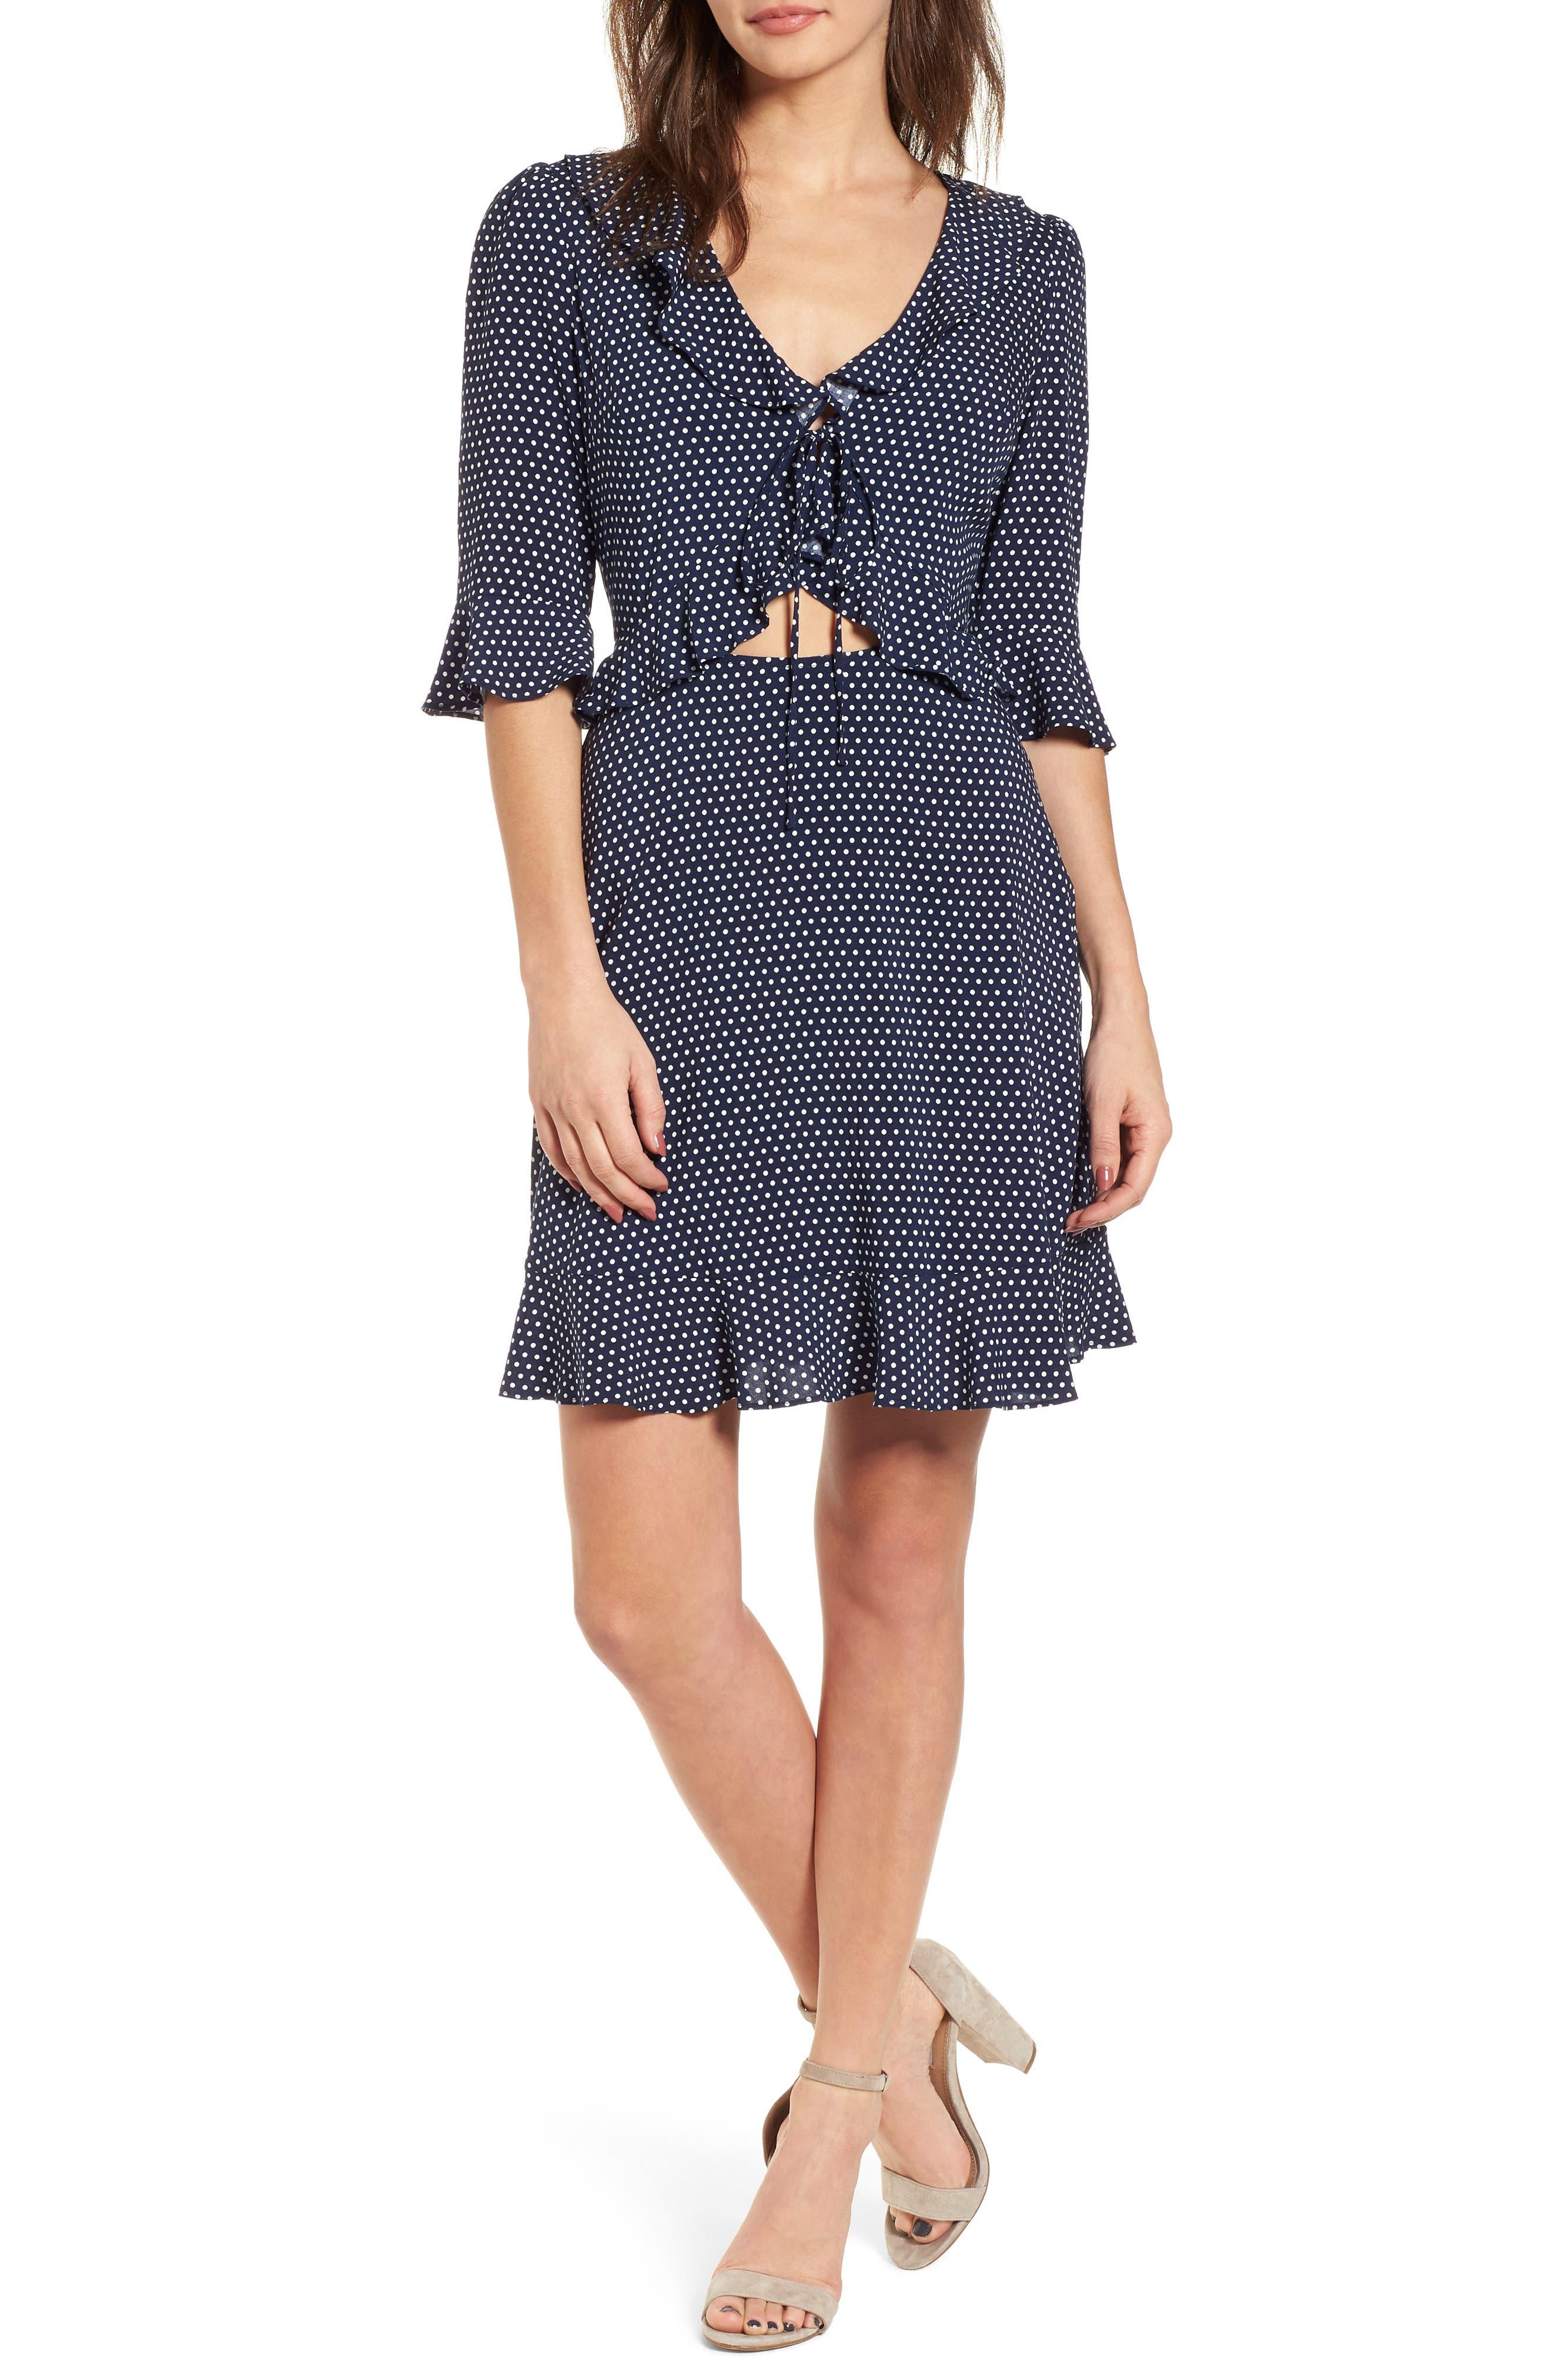 Ruffle Polka Dot Dress,                         Main,                         color,